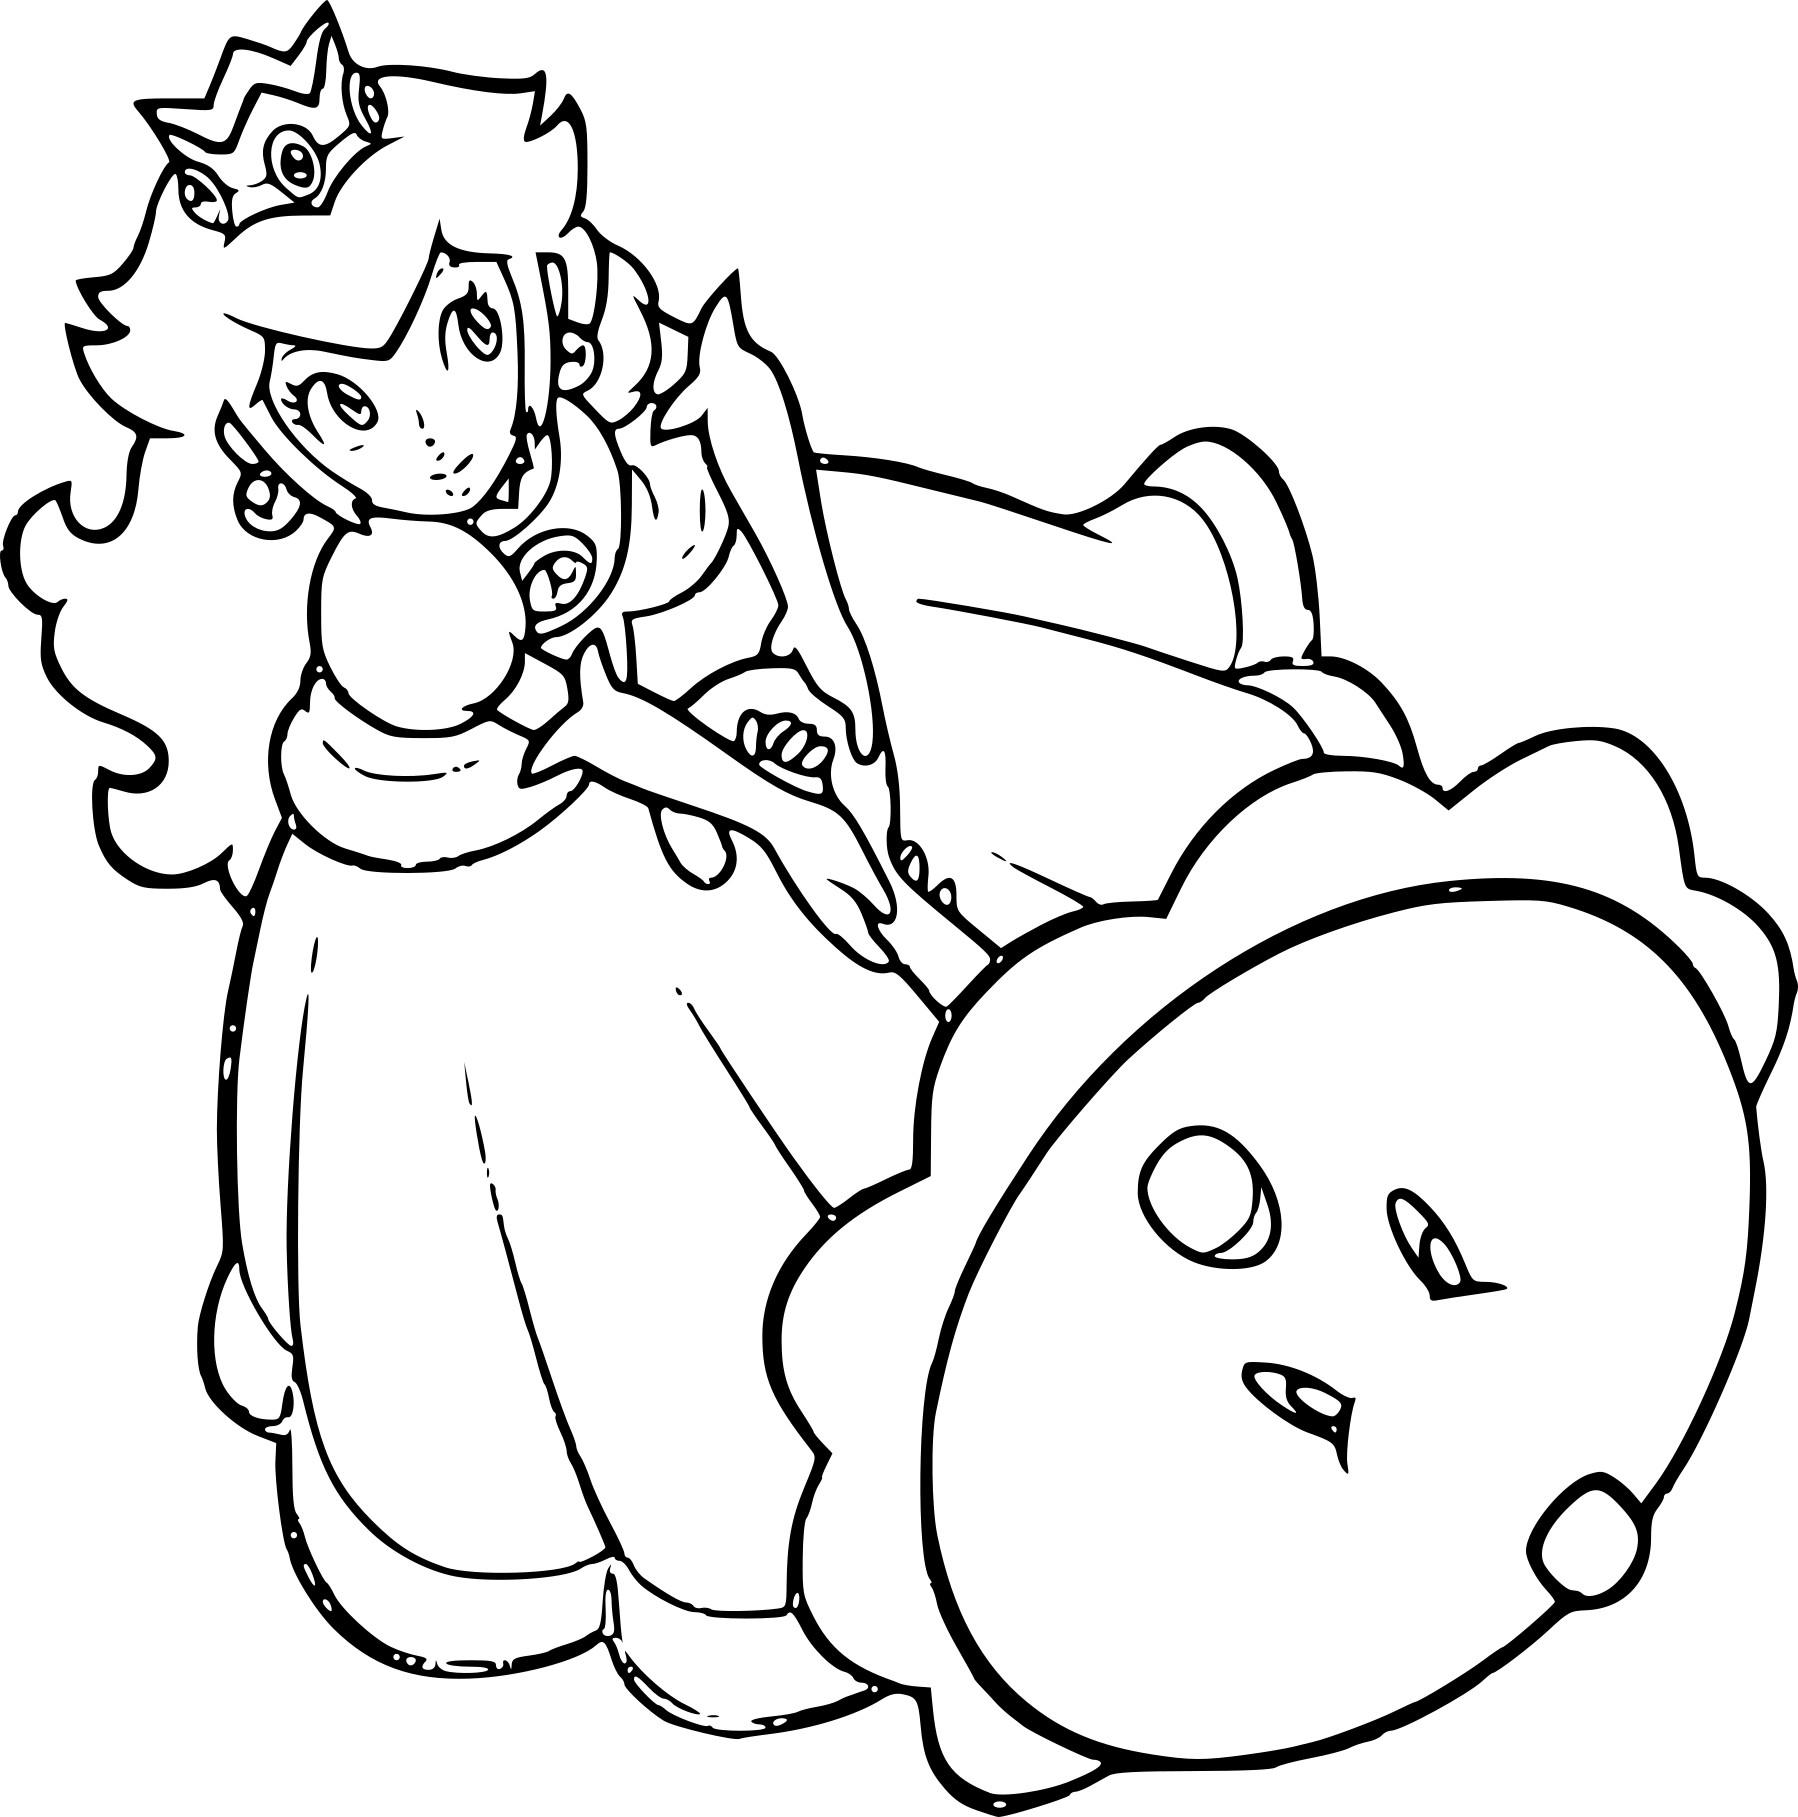 Princesse Peach dessin